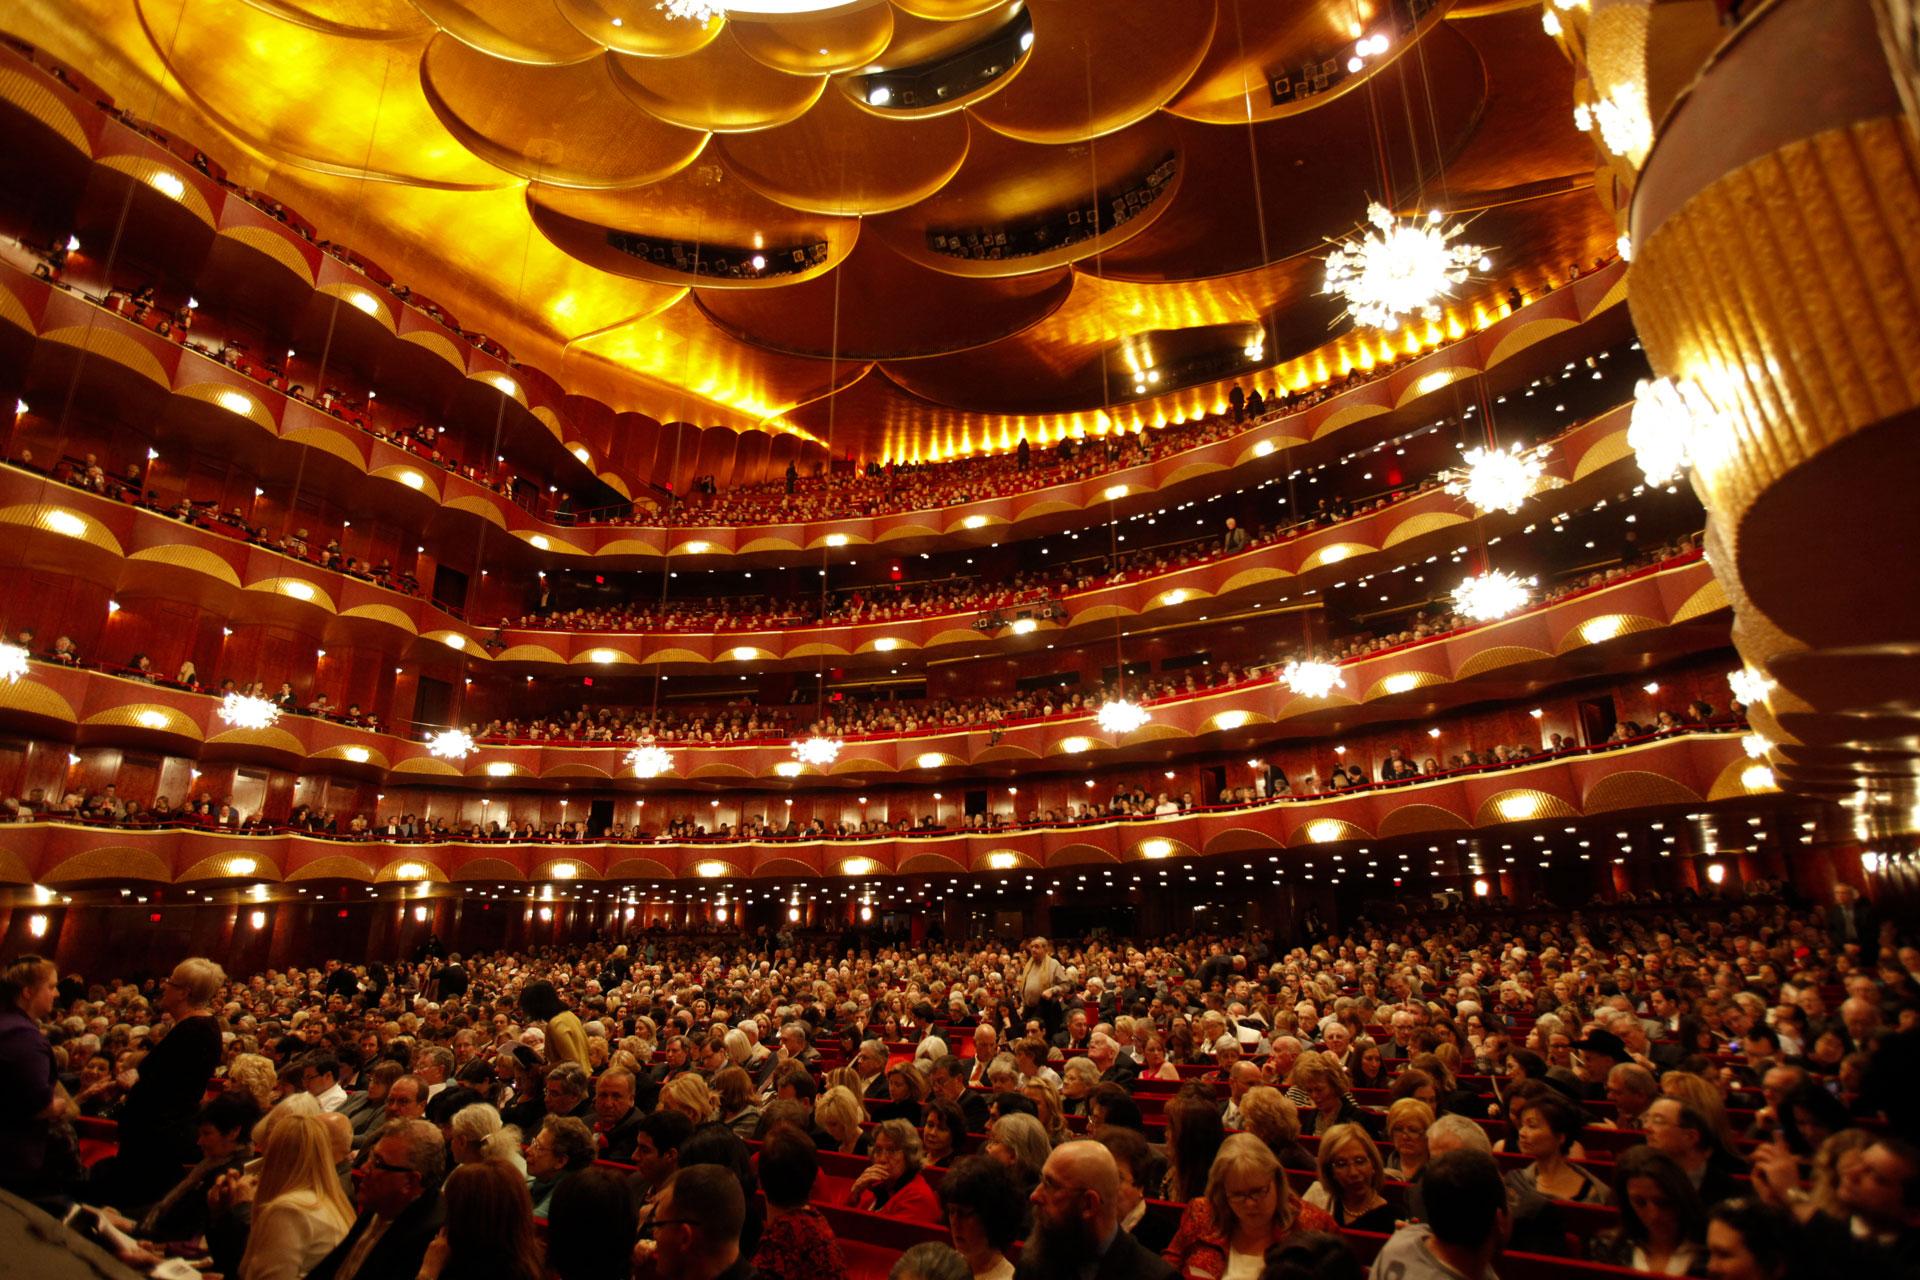 Metropolitan Opera House - New York